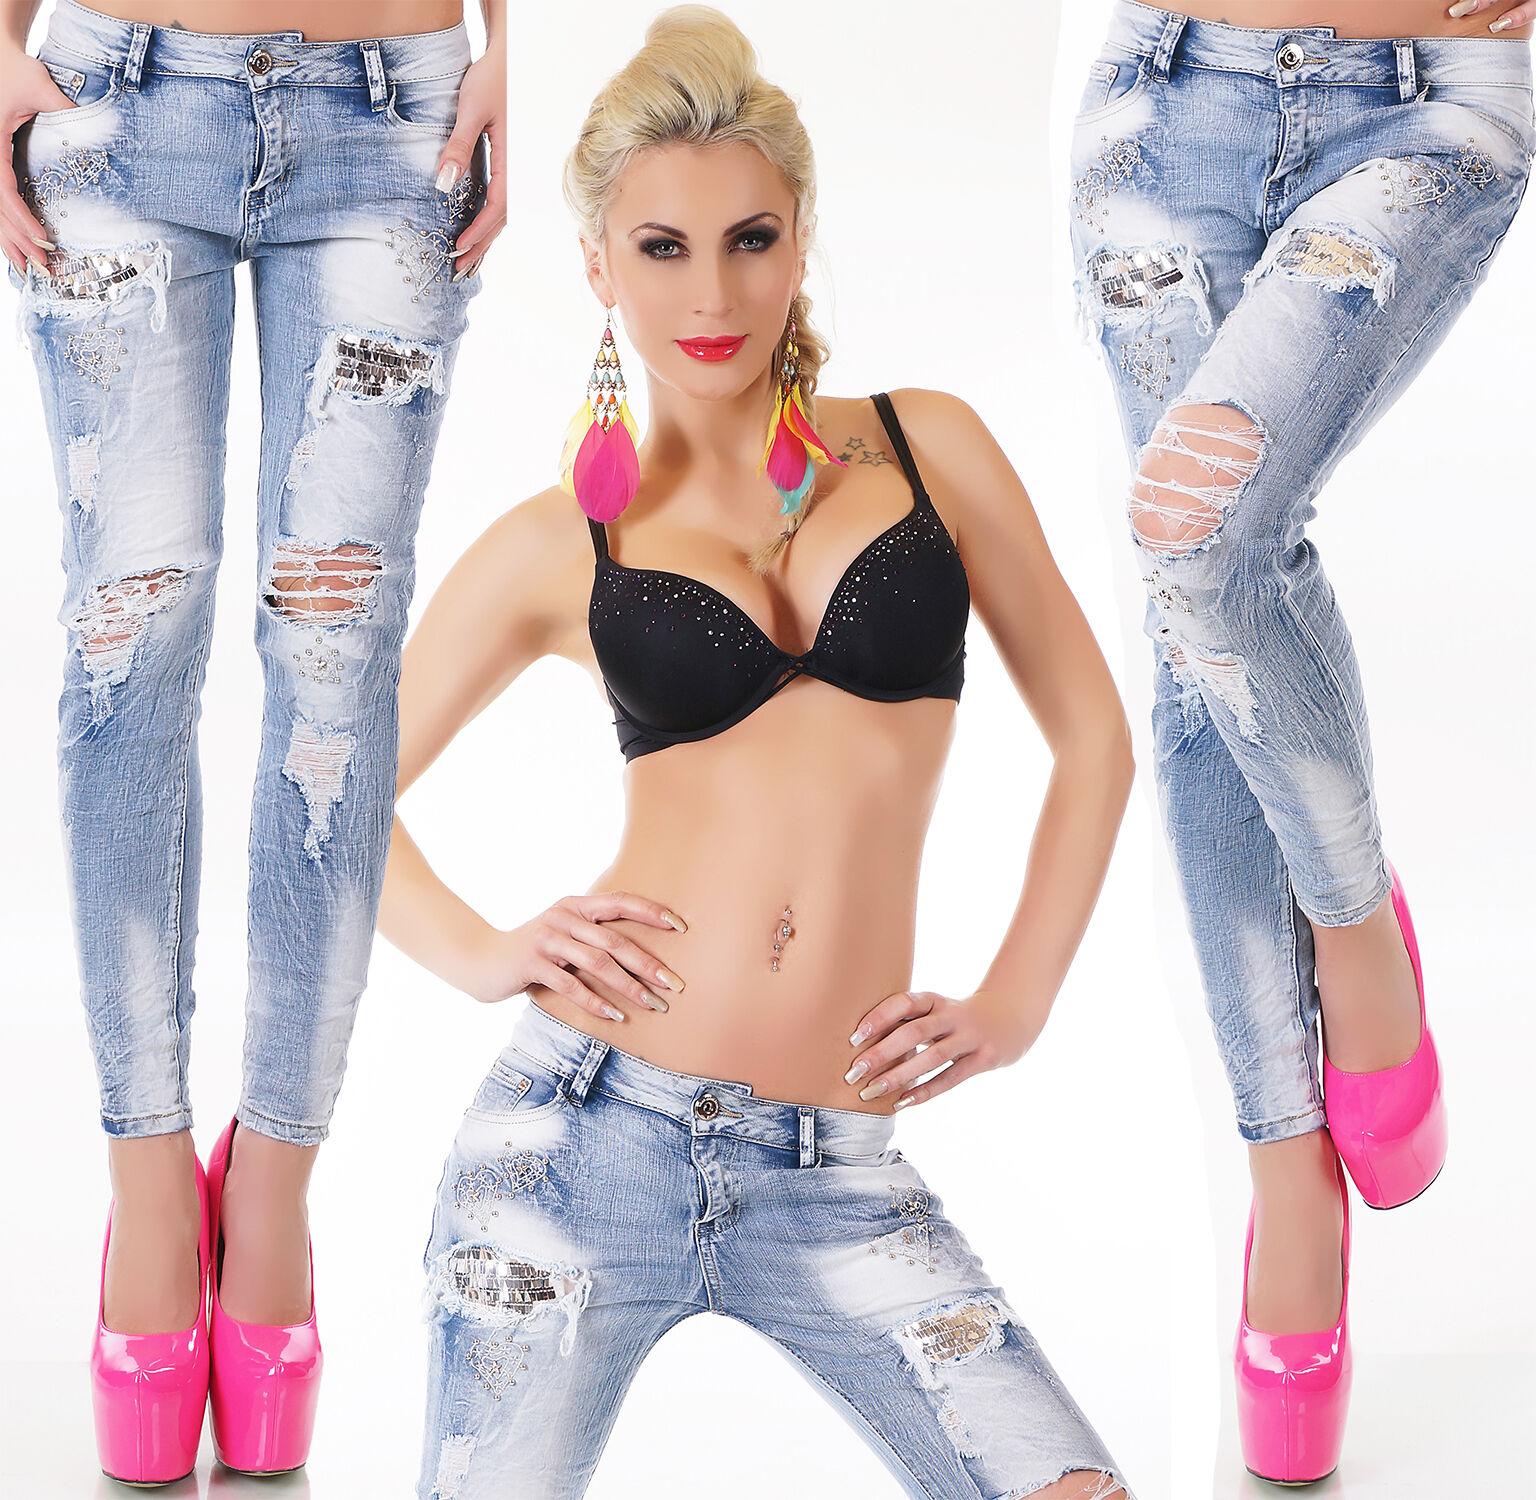 Damen Jeans Hose Röhrenjeans Skinny Stretch Destroyed Vintage Pailletten XS-XL